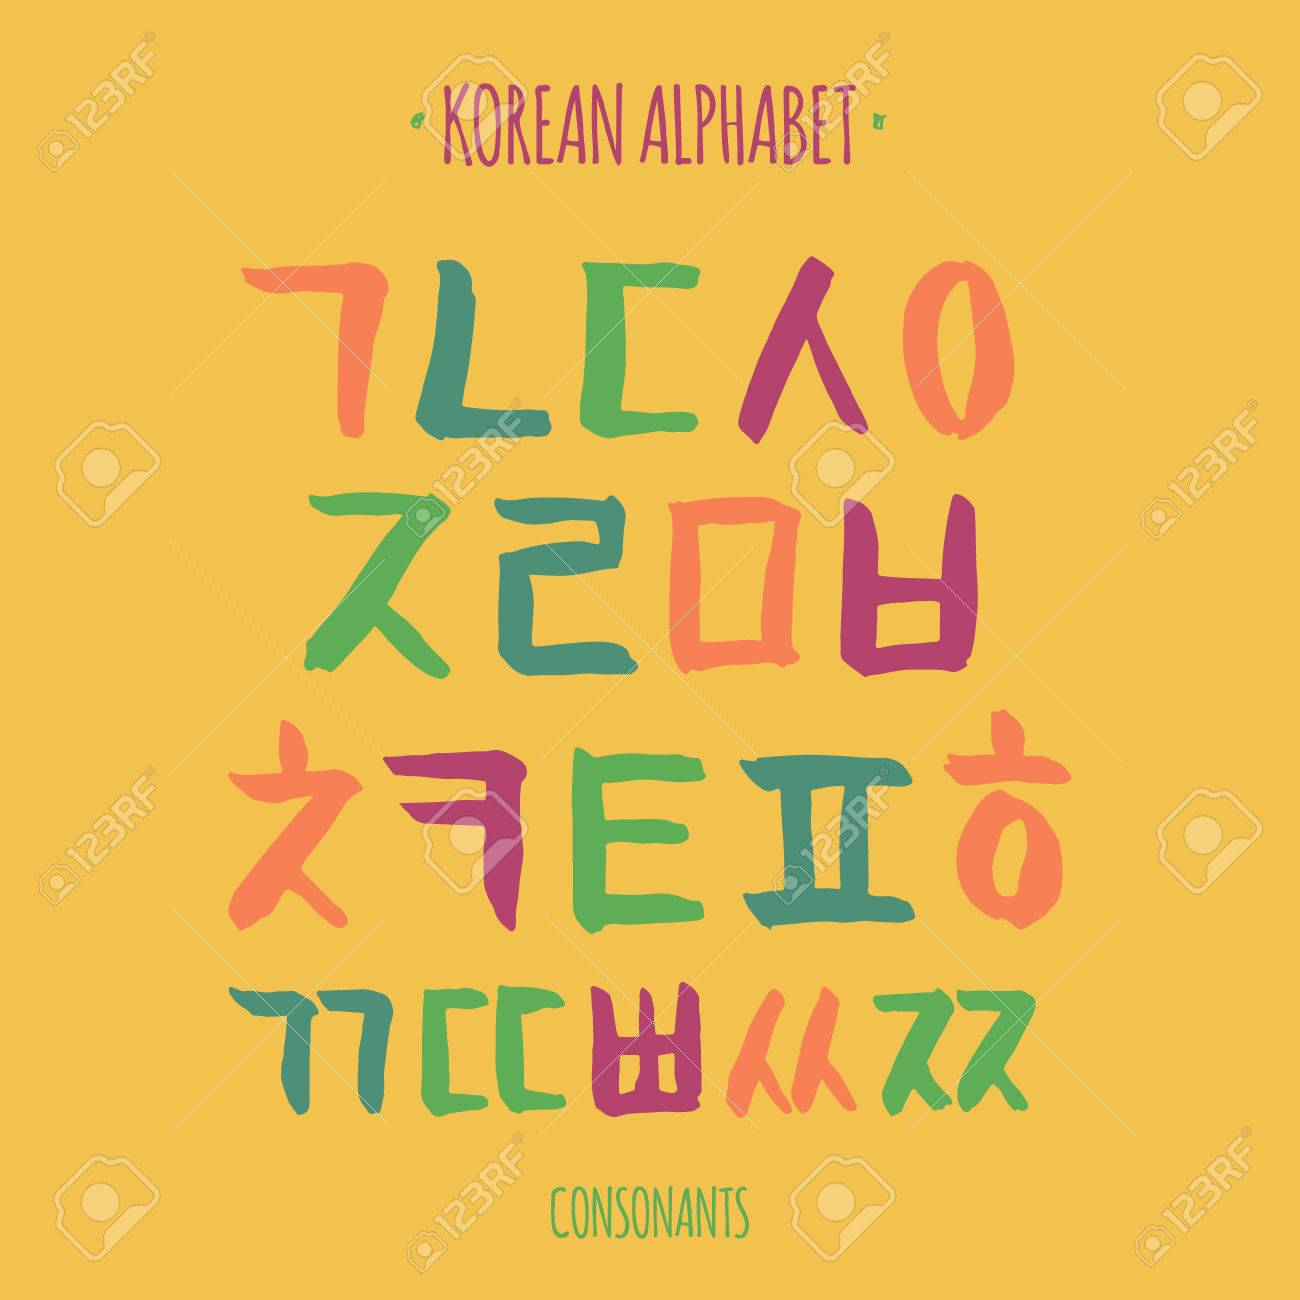 korean vector alphabet set hangul consonants in hand drawn style royalty free cliparts vectors and stock illustration image 59380373 korean vector alphabet set hangul consonants in hand drawn style